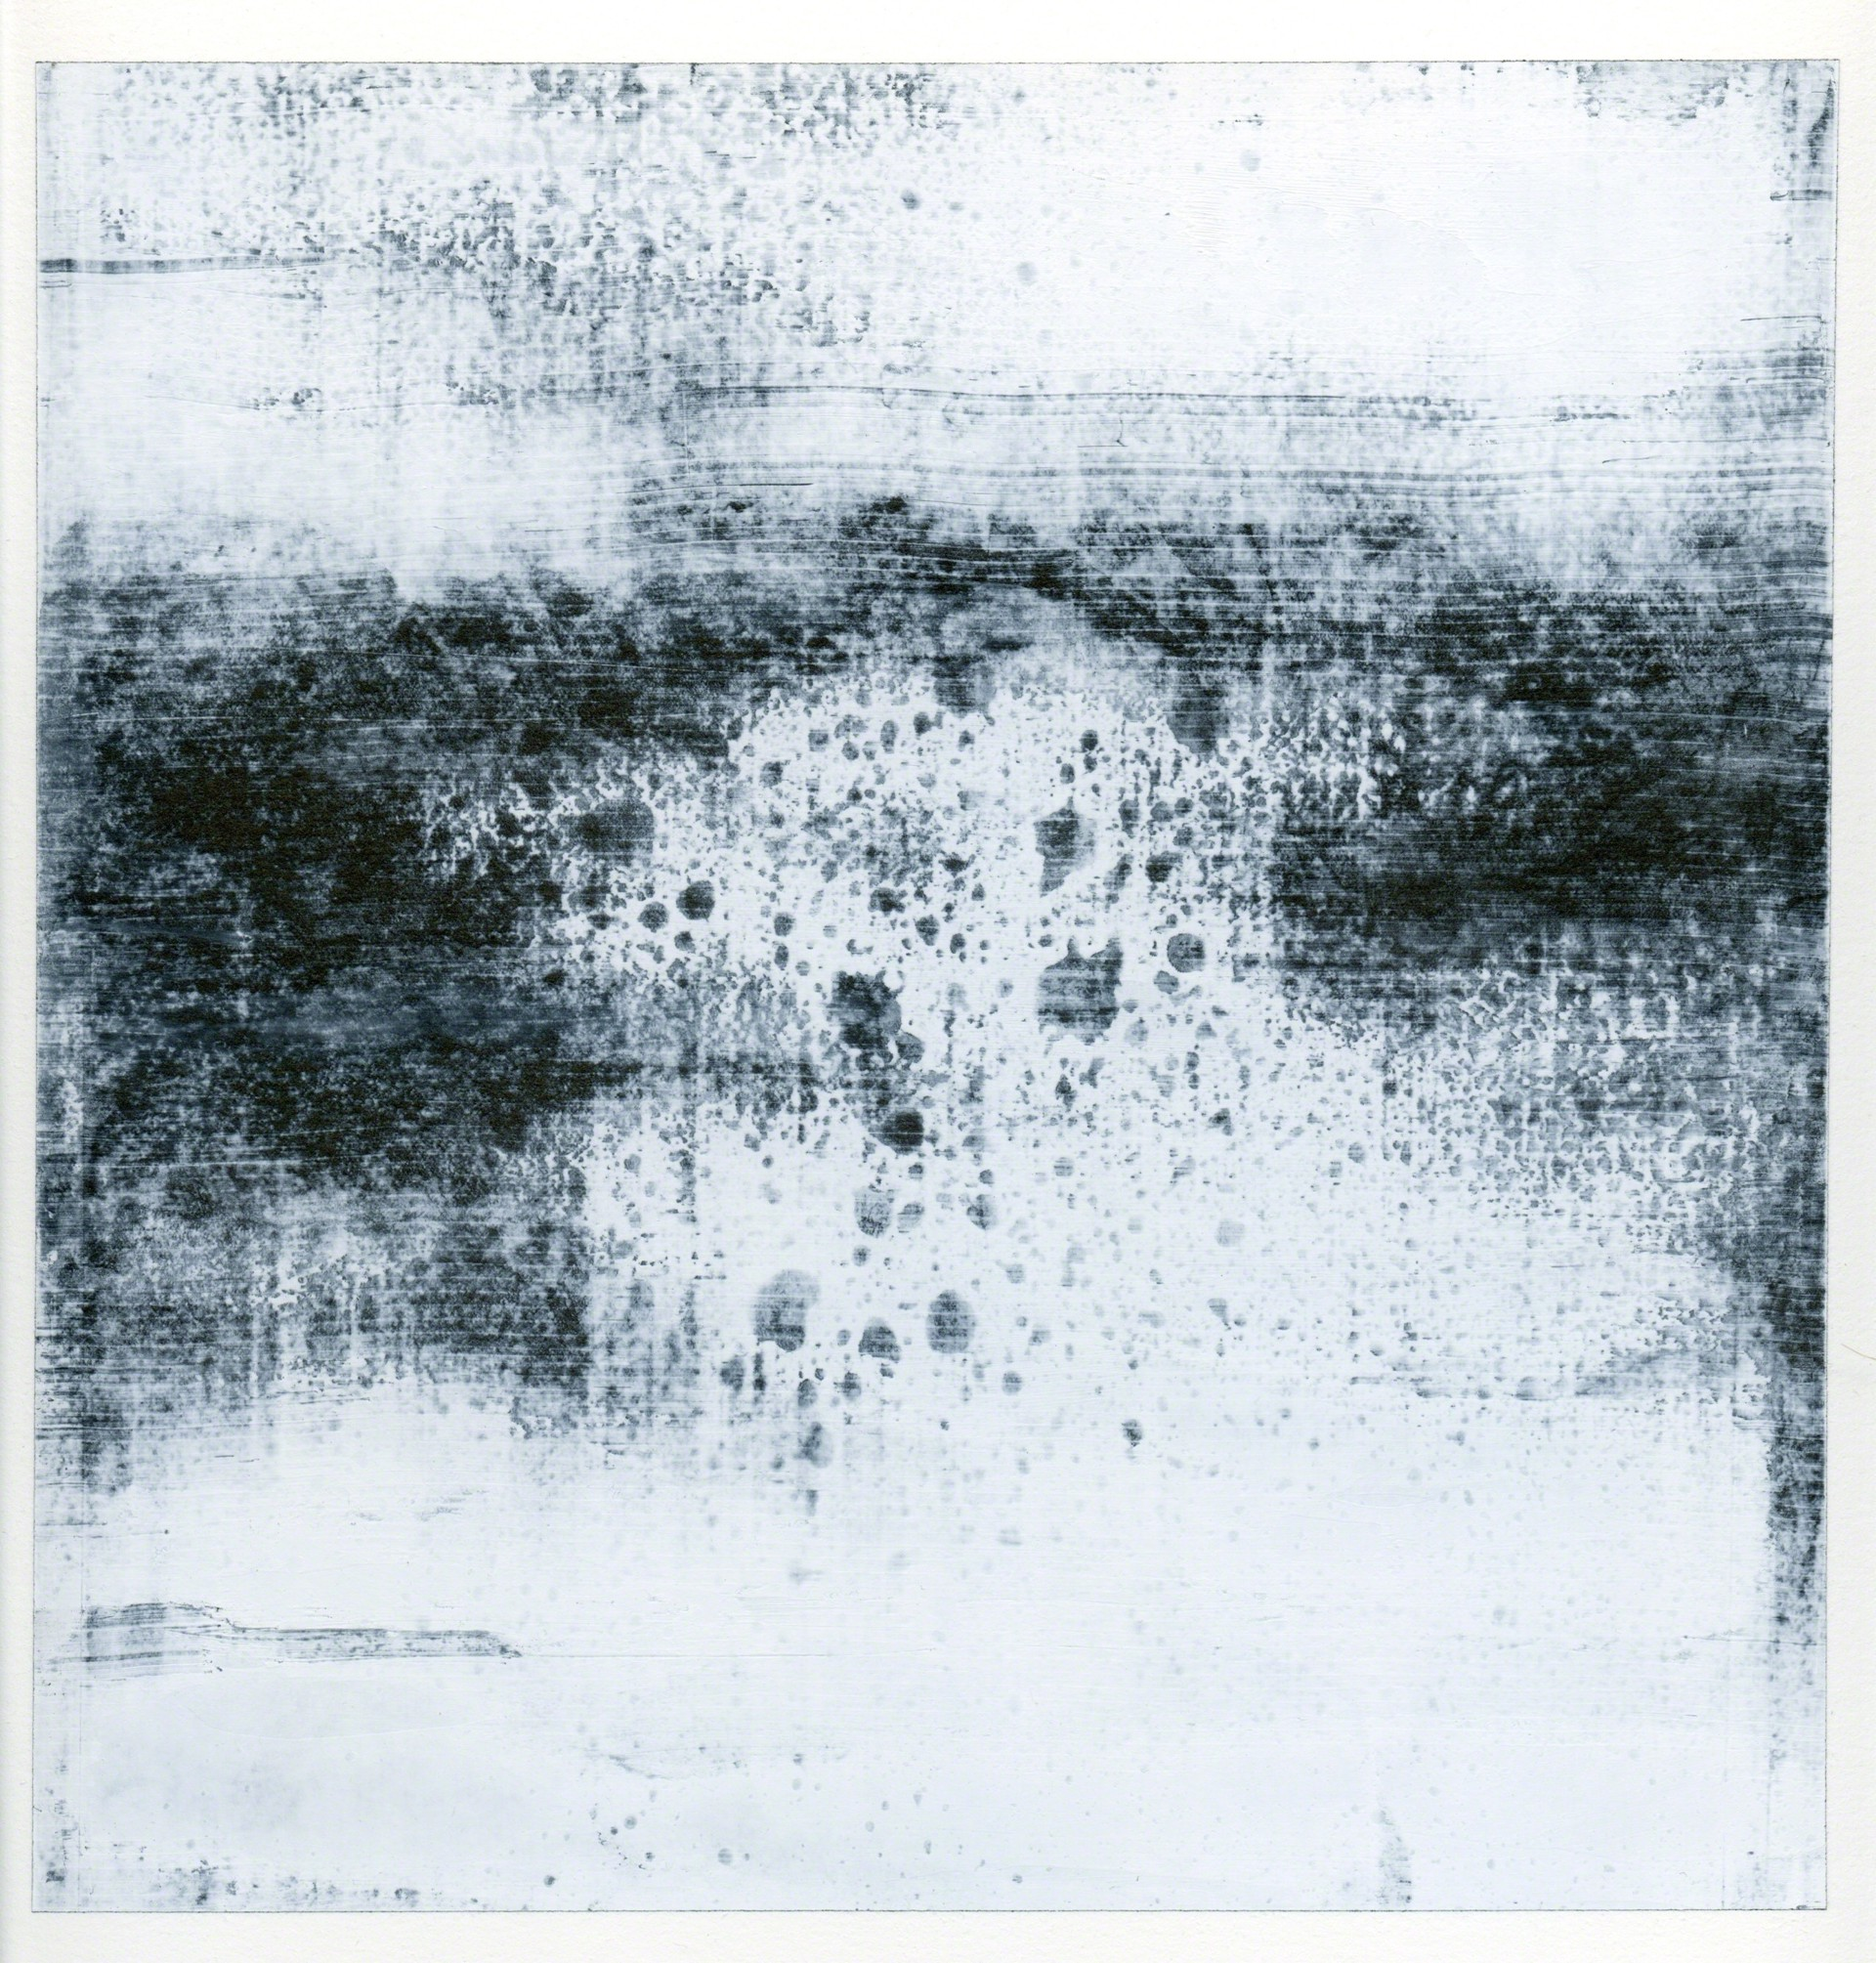 Untitled (17.10.30) by Paul Moran